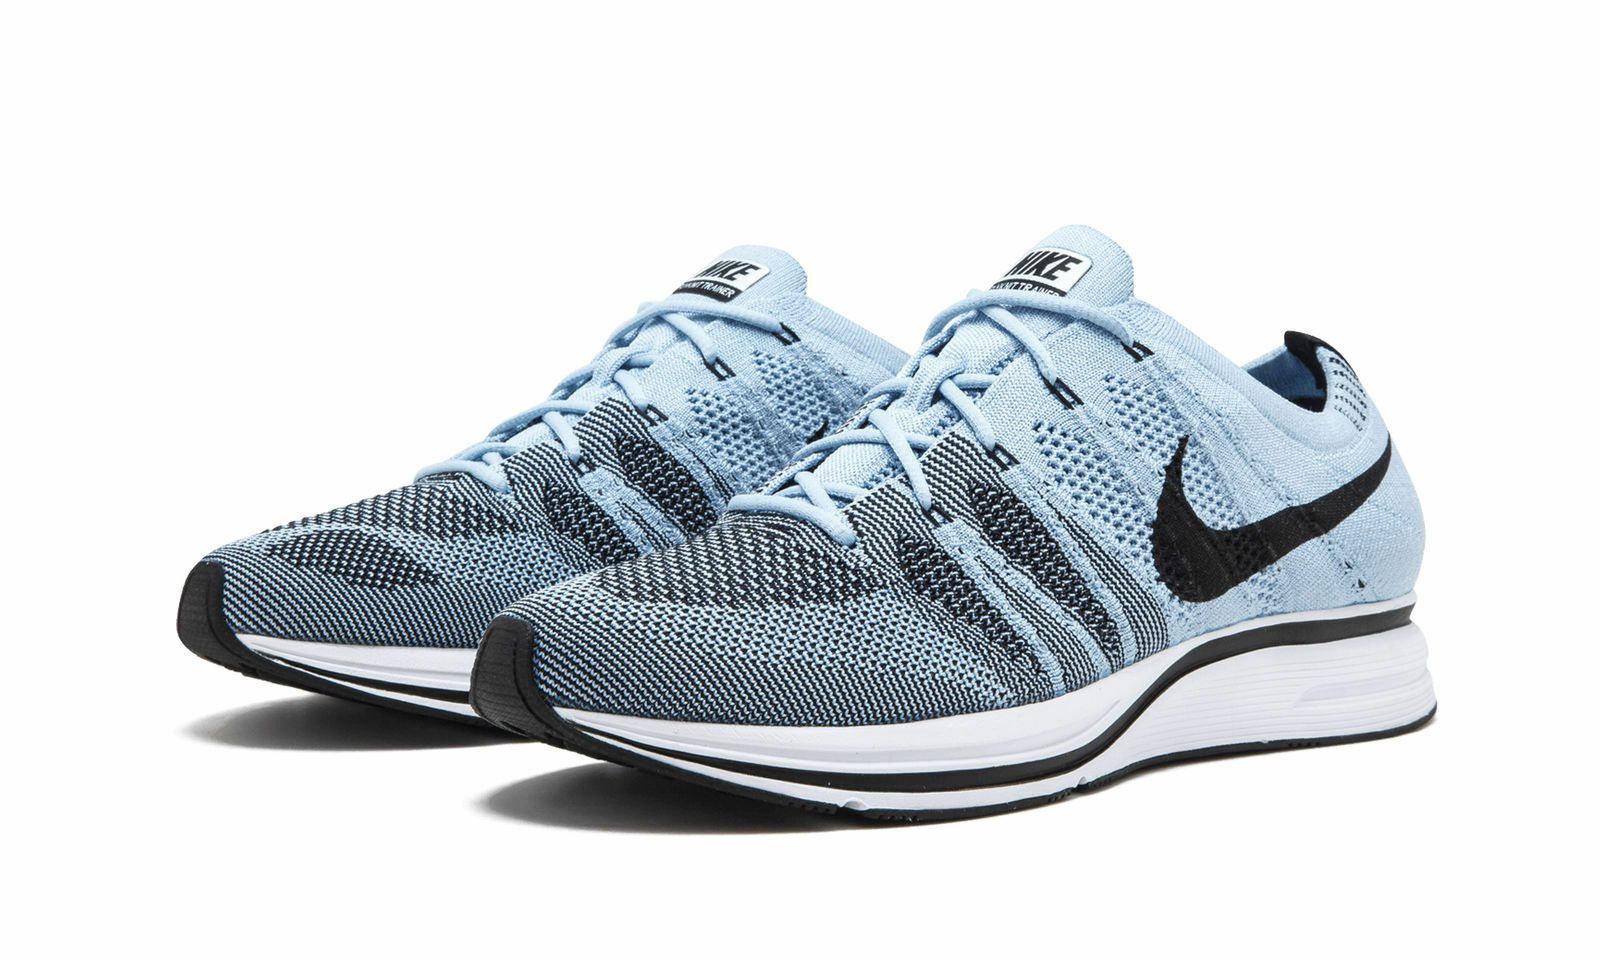 Nike nikelab flyknit allenatore blue scarpe wmns scarpe sz Uomo 9 wmns scarpe 10,5 ah8396-400 dbe0d3